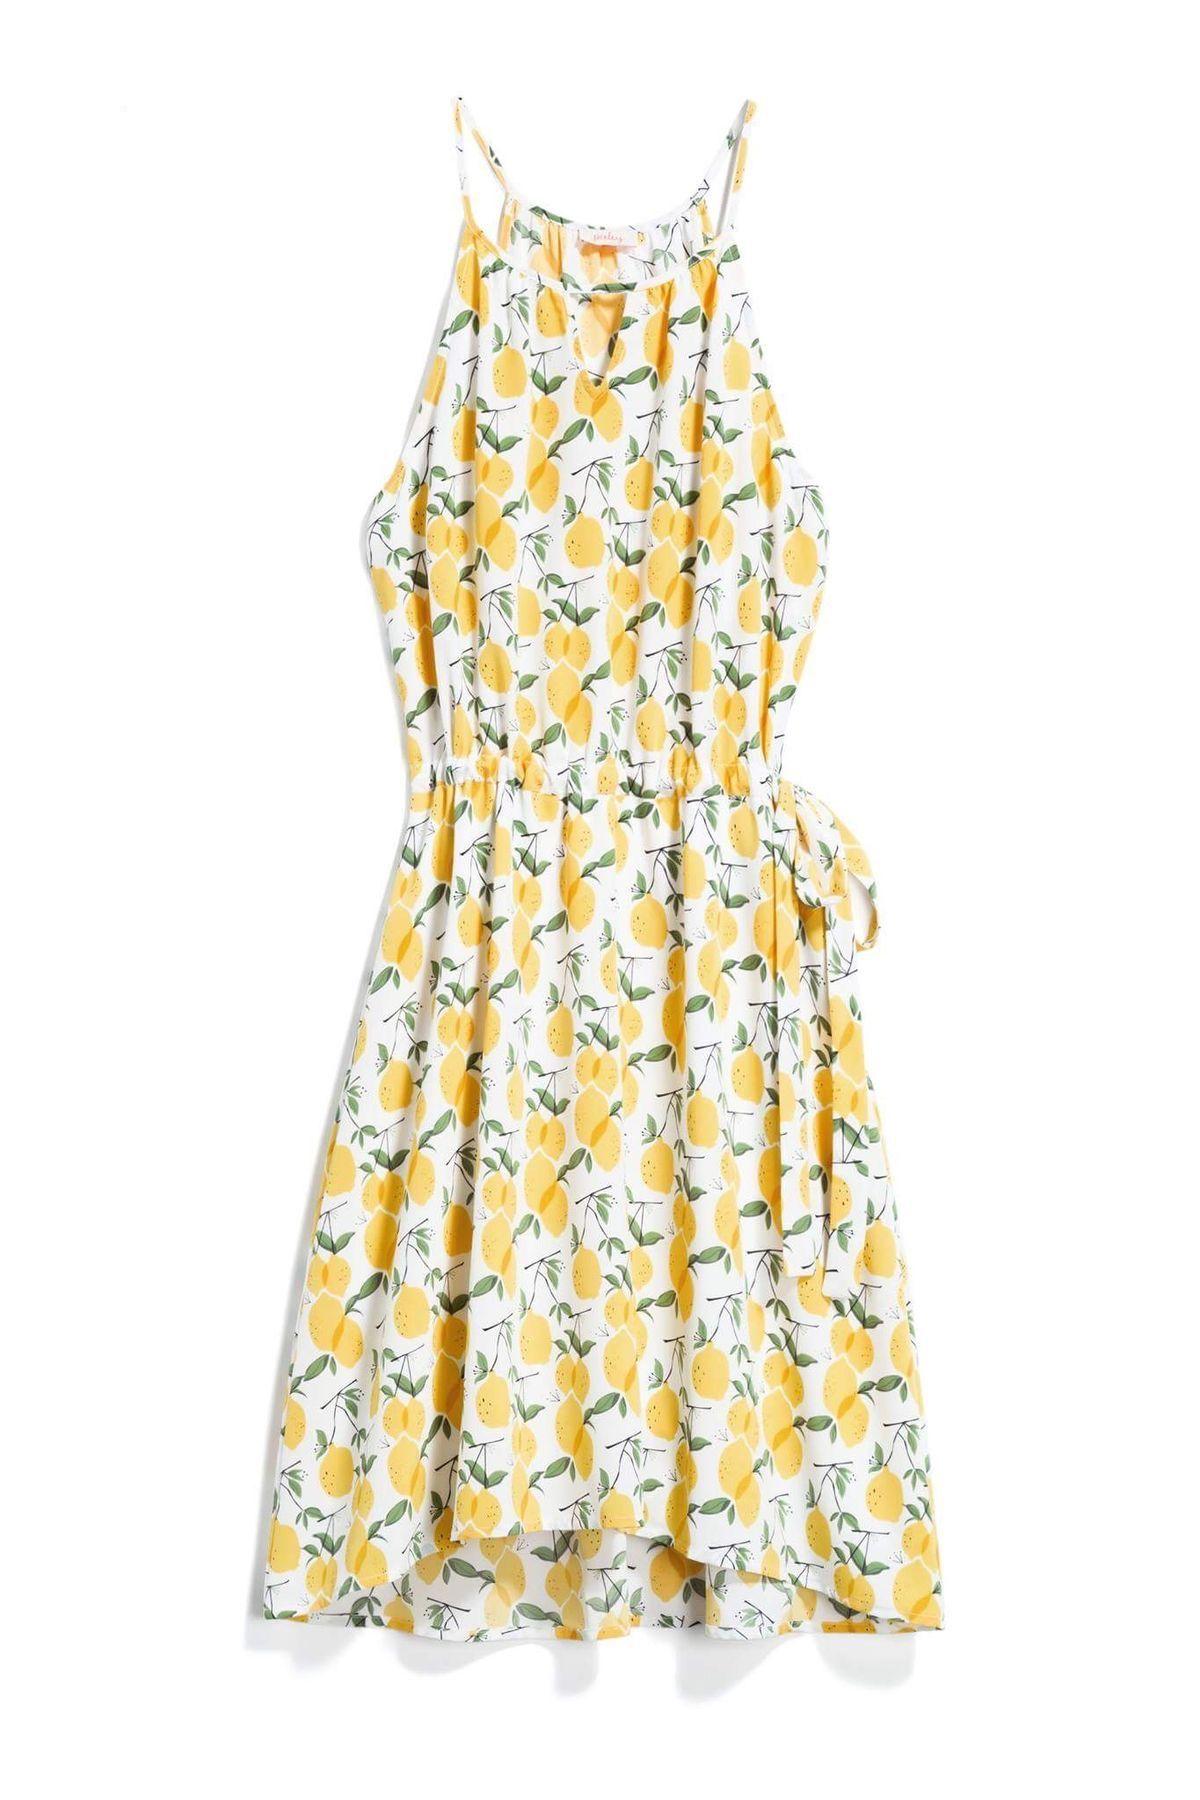 Pixley yellow lemon dress stitch fix style quiz dress in